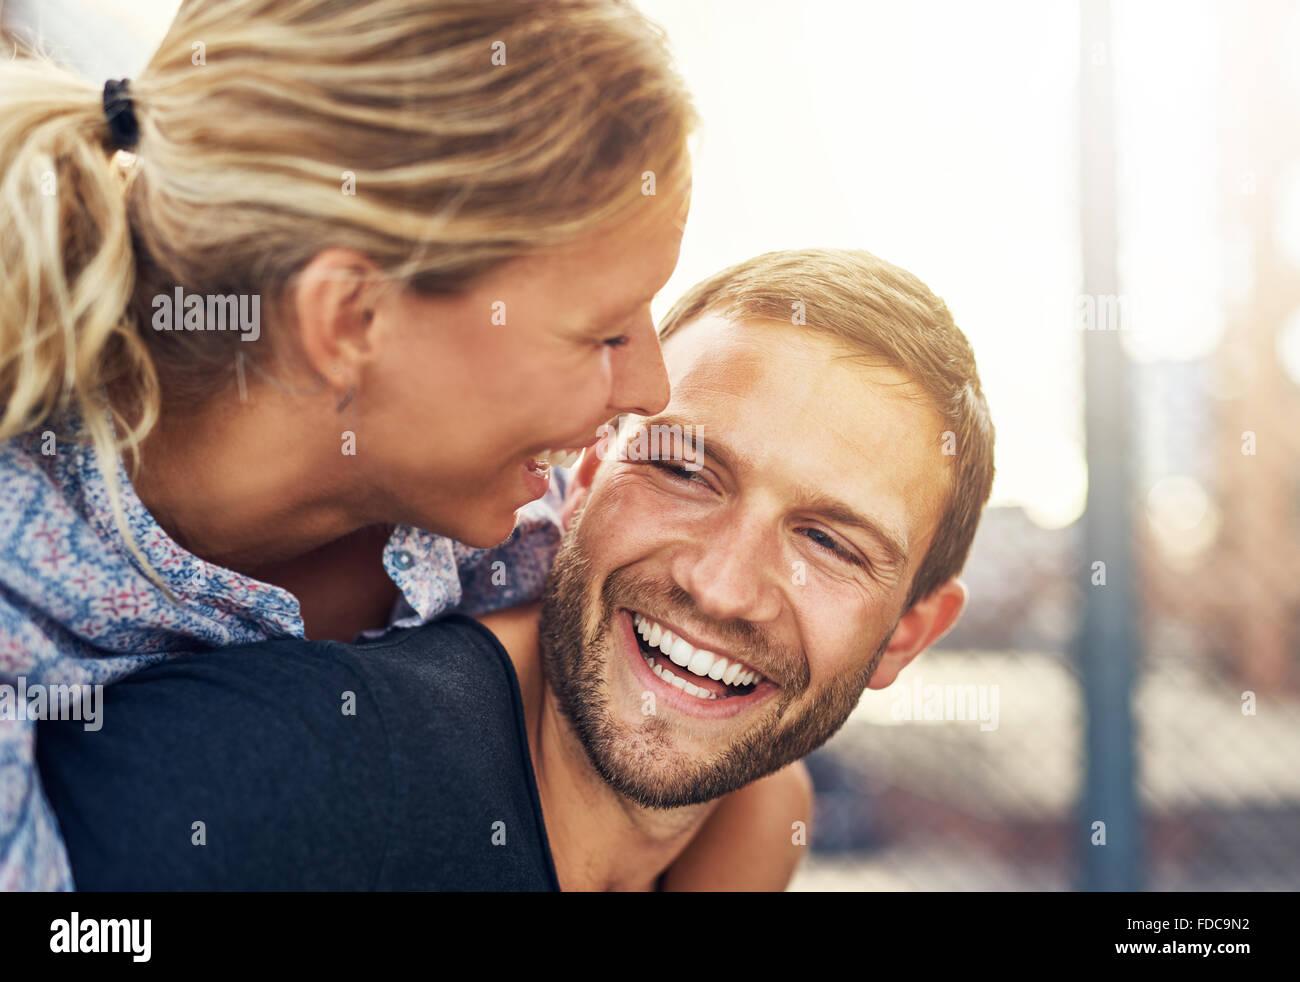 Closeup, Loving Couple, Blonde Woman and Beautiful Man - Stock Image